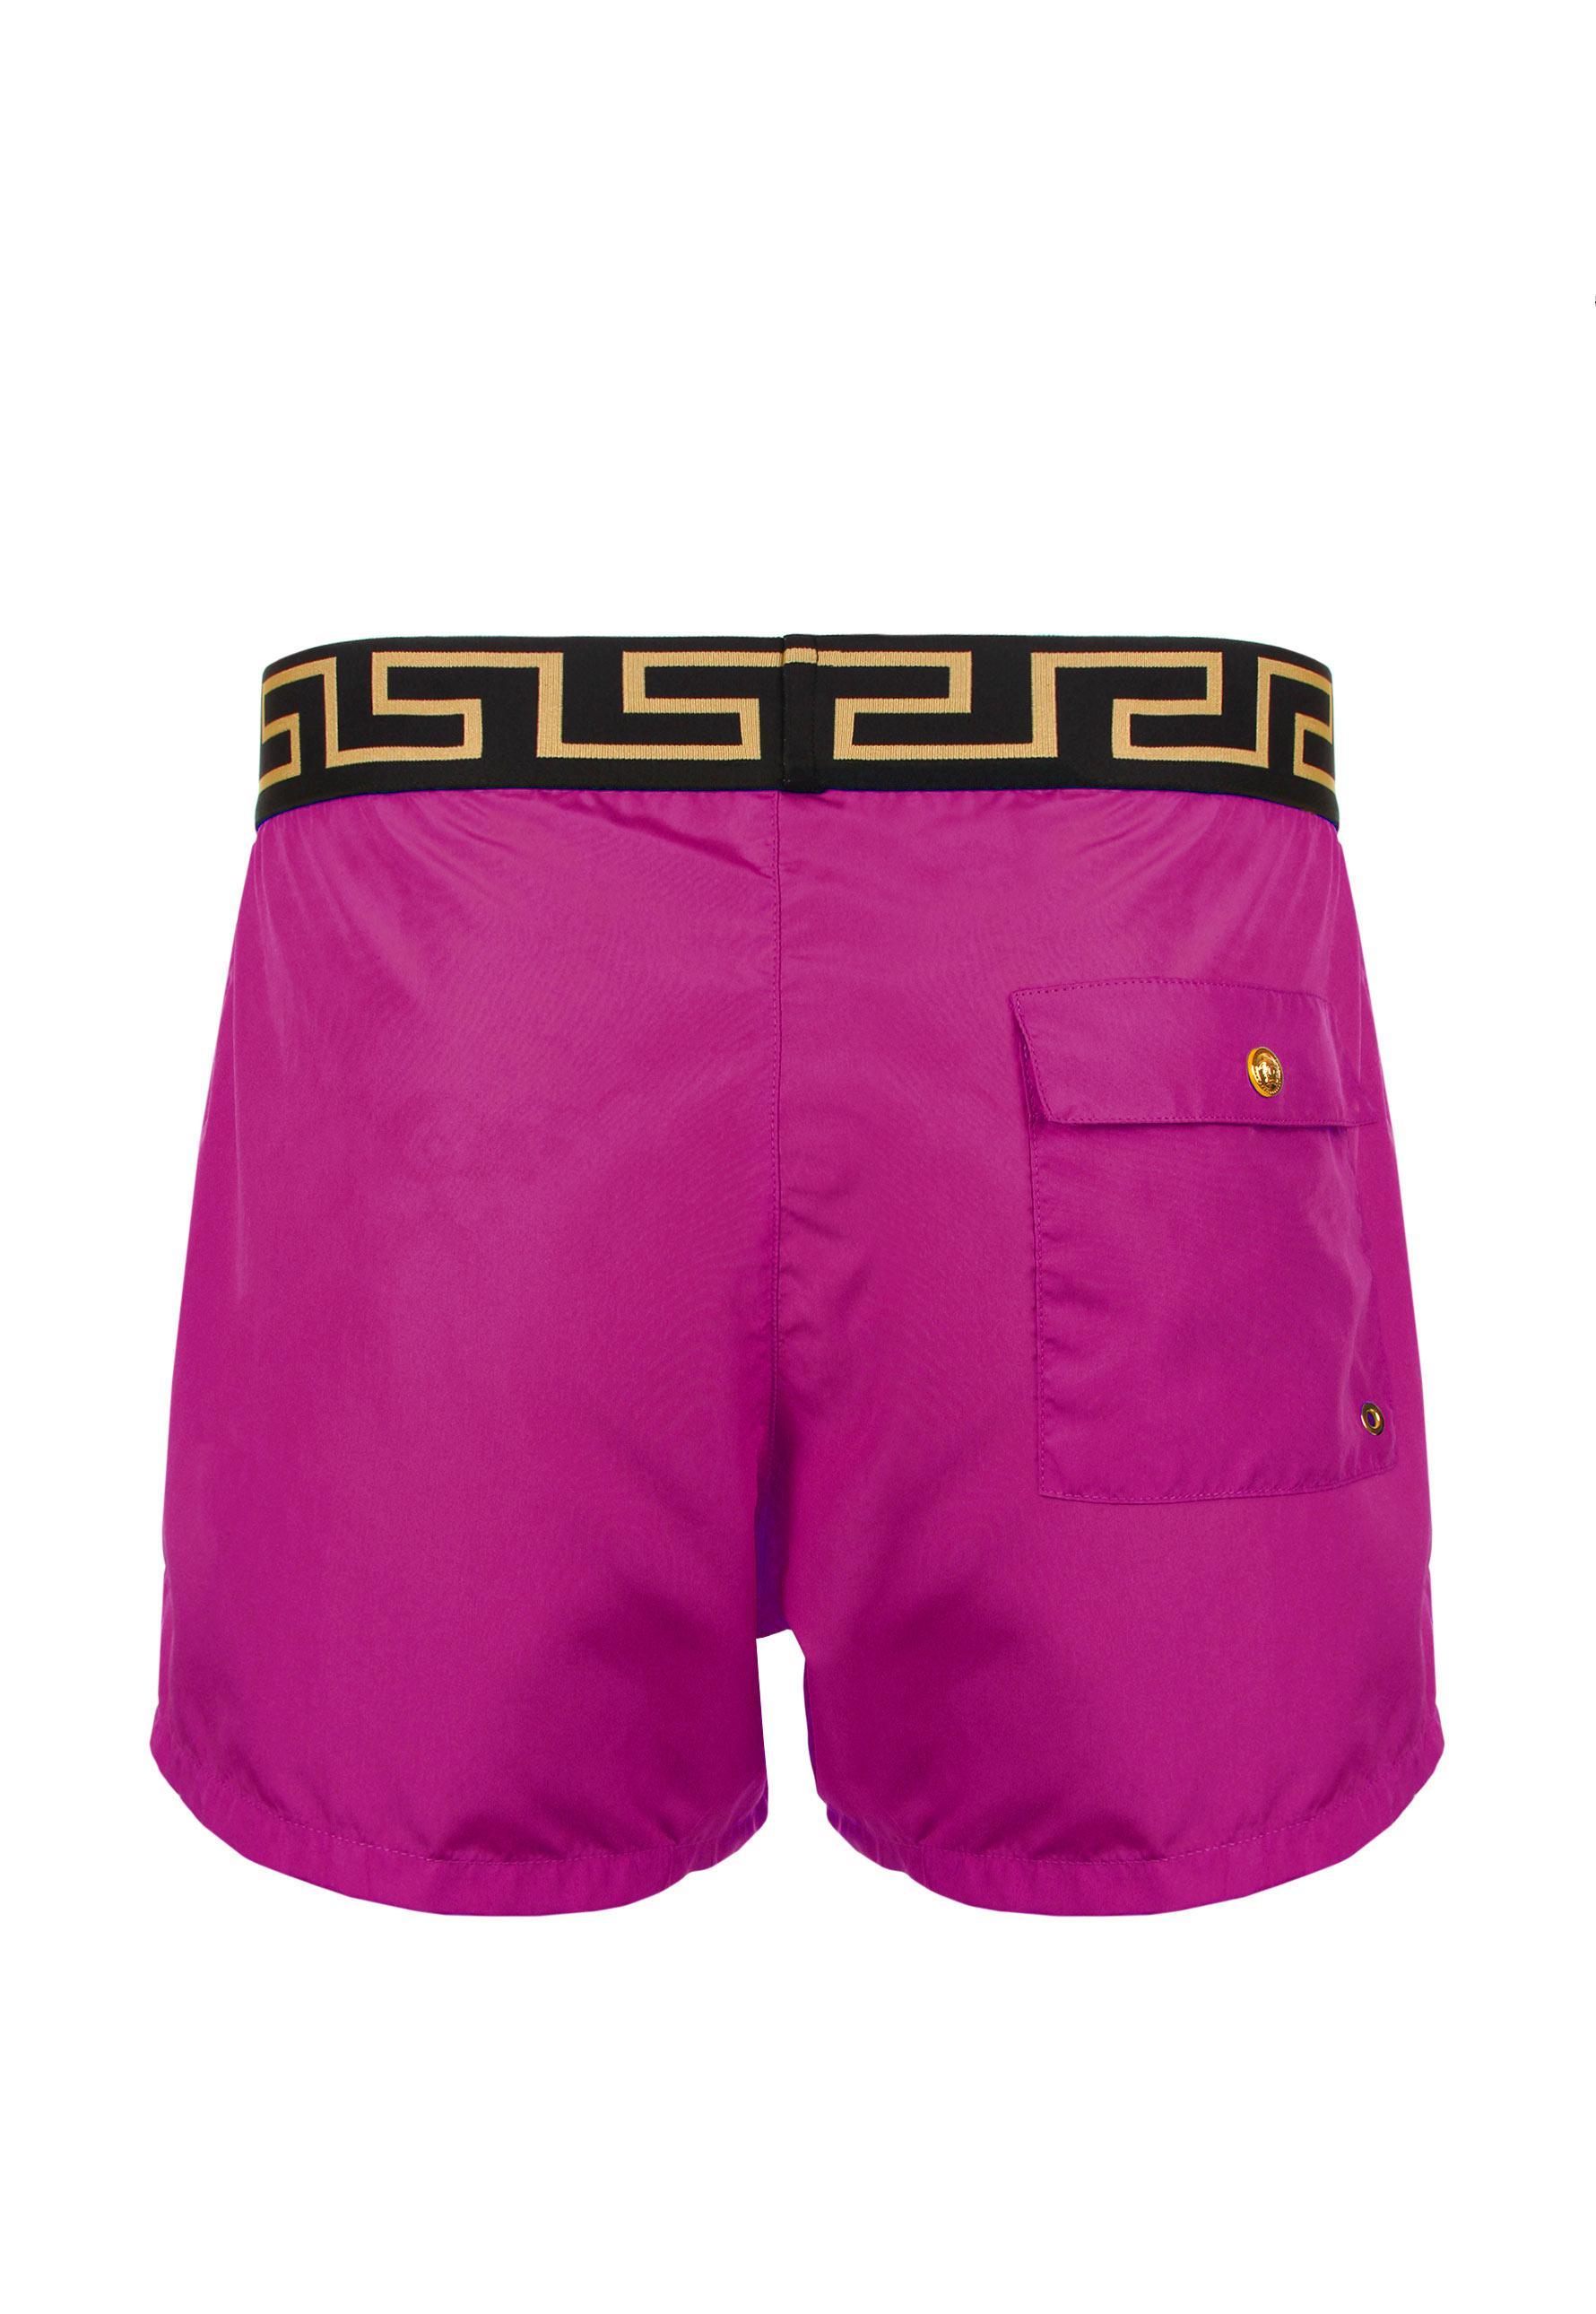 d0b8d67b88 Versace Iconic Greca Swimming Shorts Fuchsia in Purple for Men - Lyst